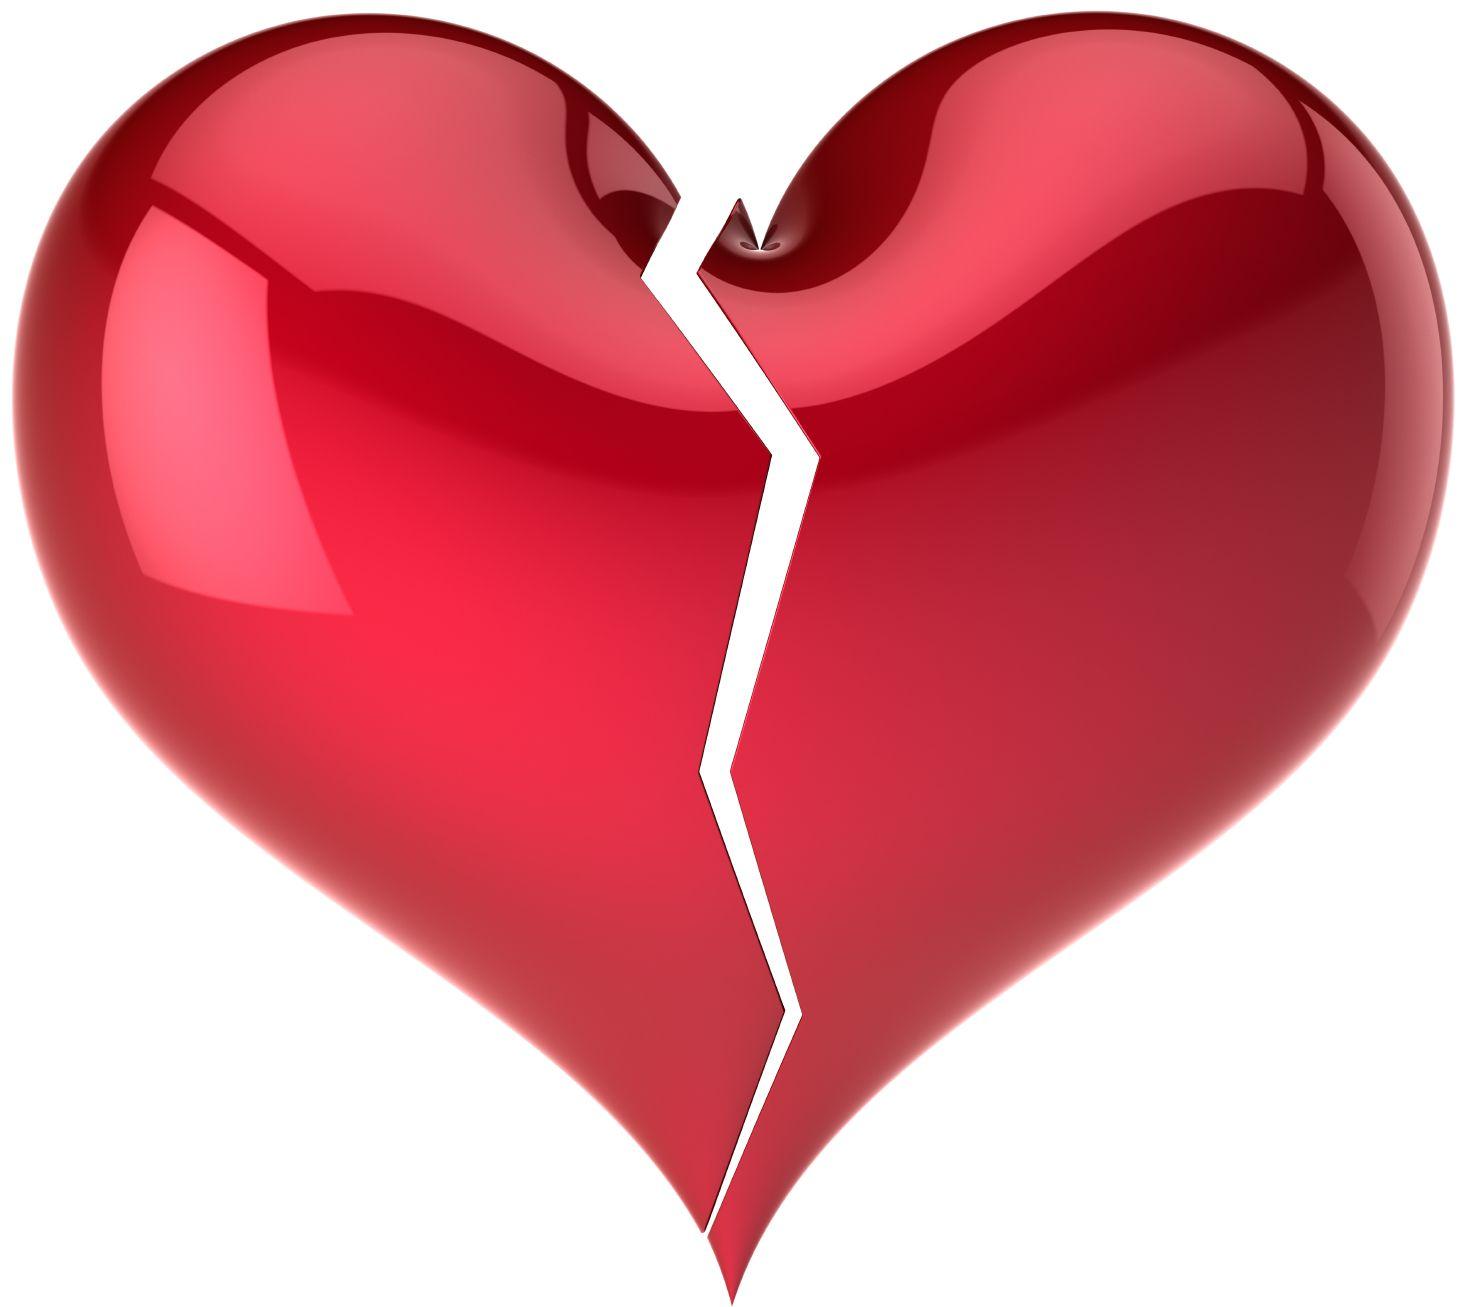 Broken hearts google search broken damaged pinterest broken hearts google search biocorpaavc Images